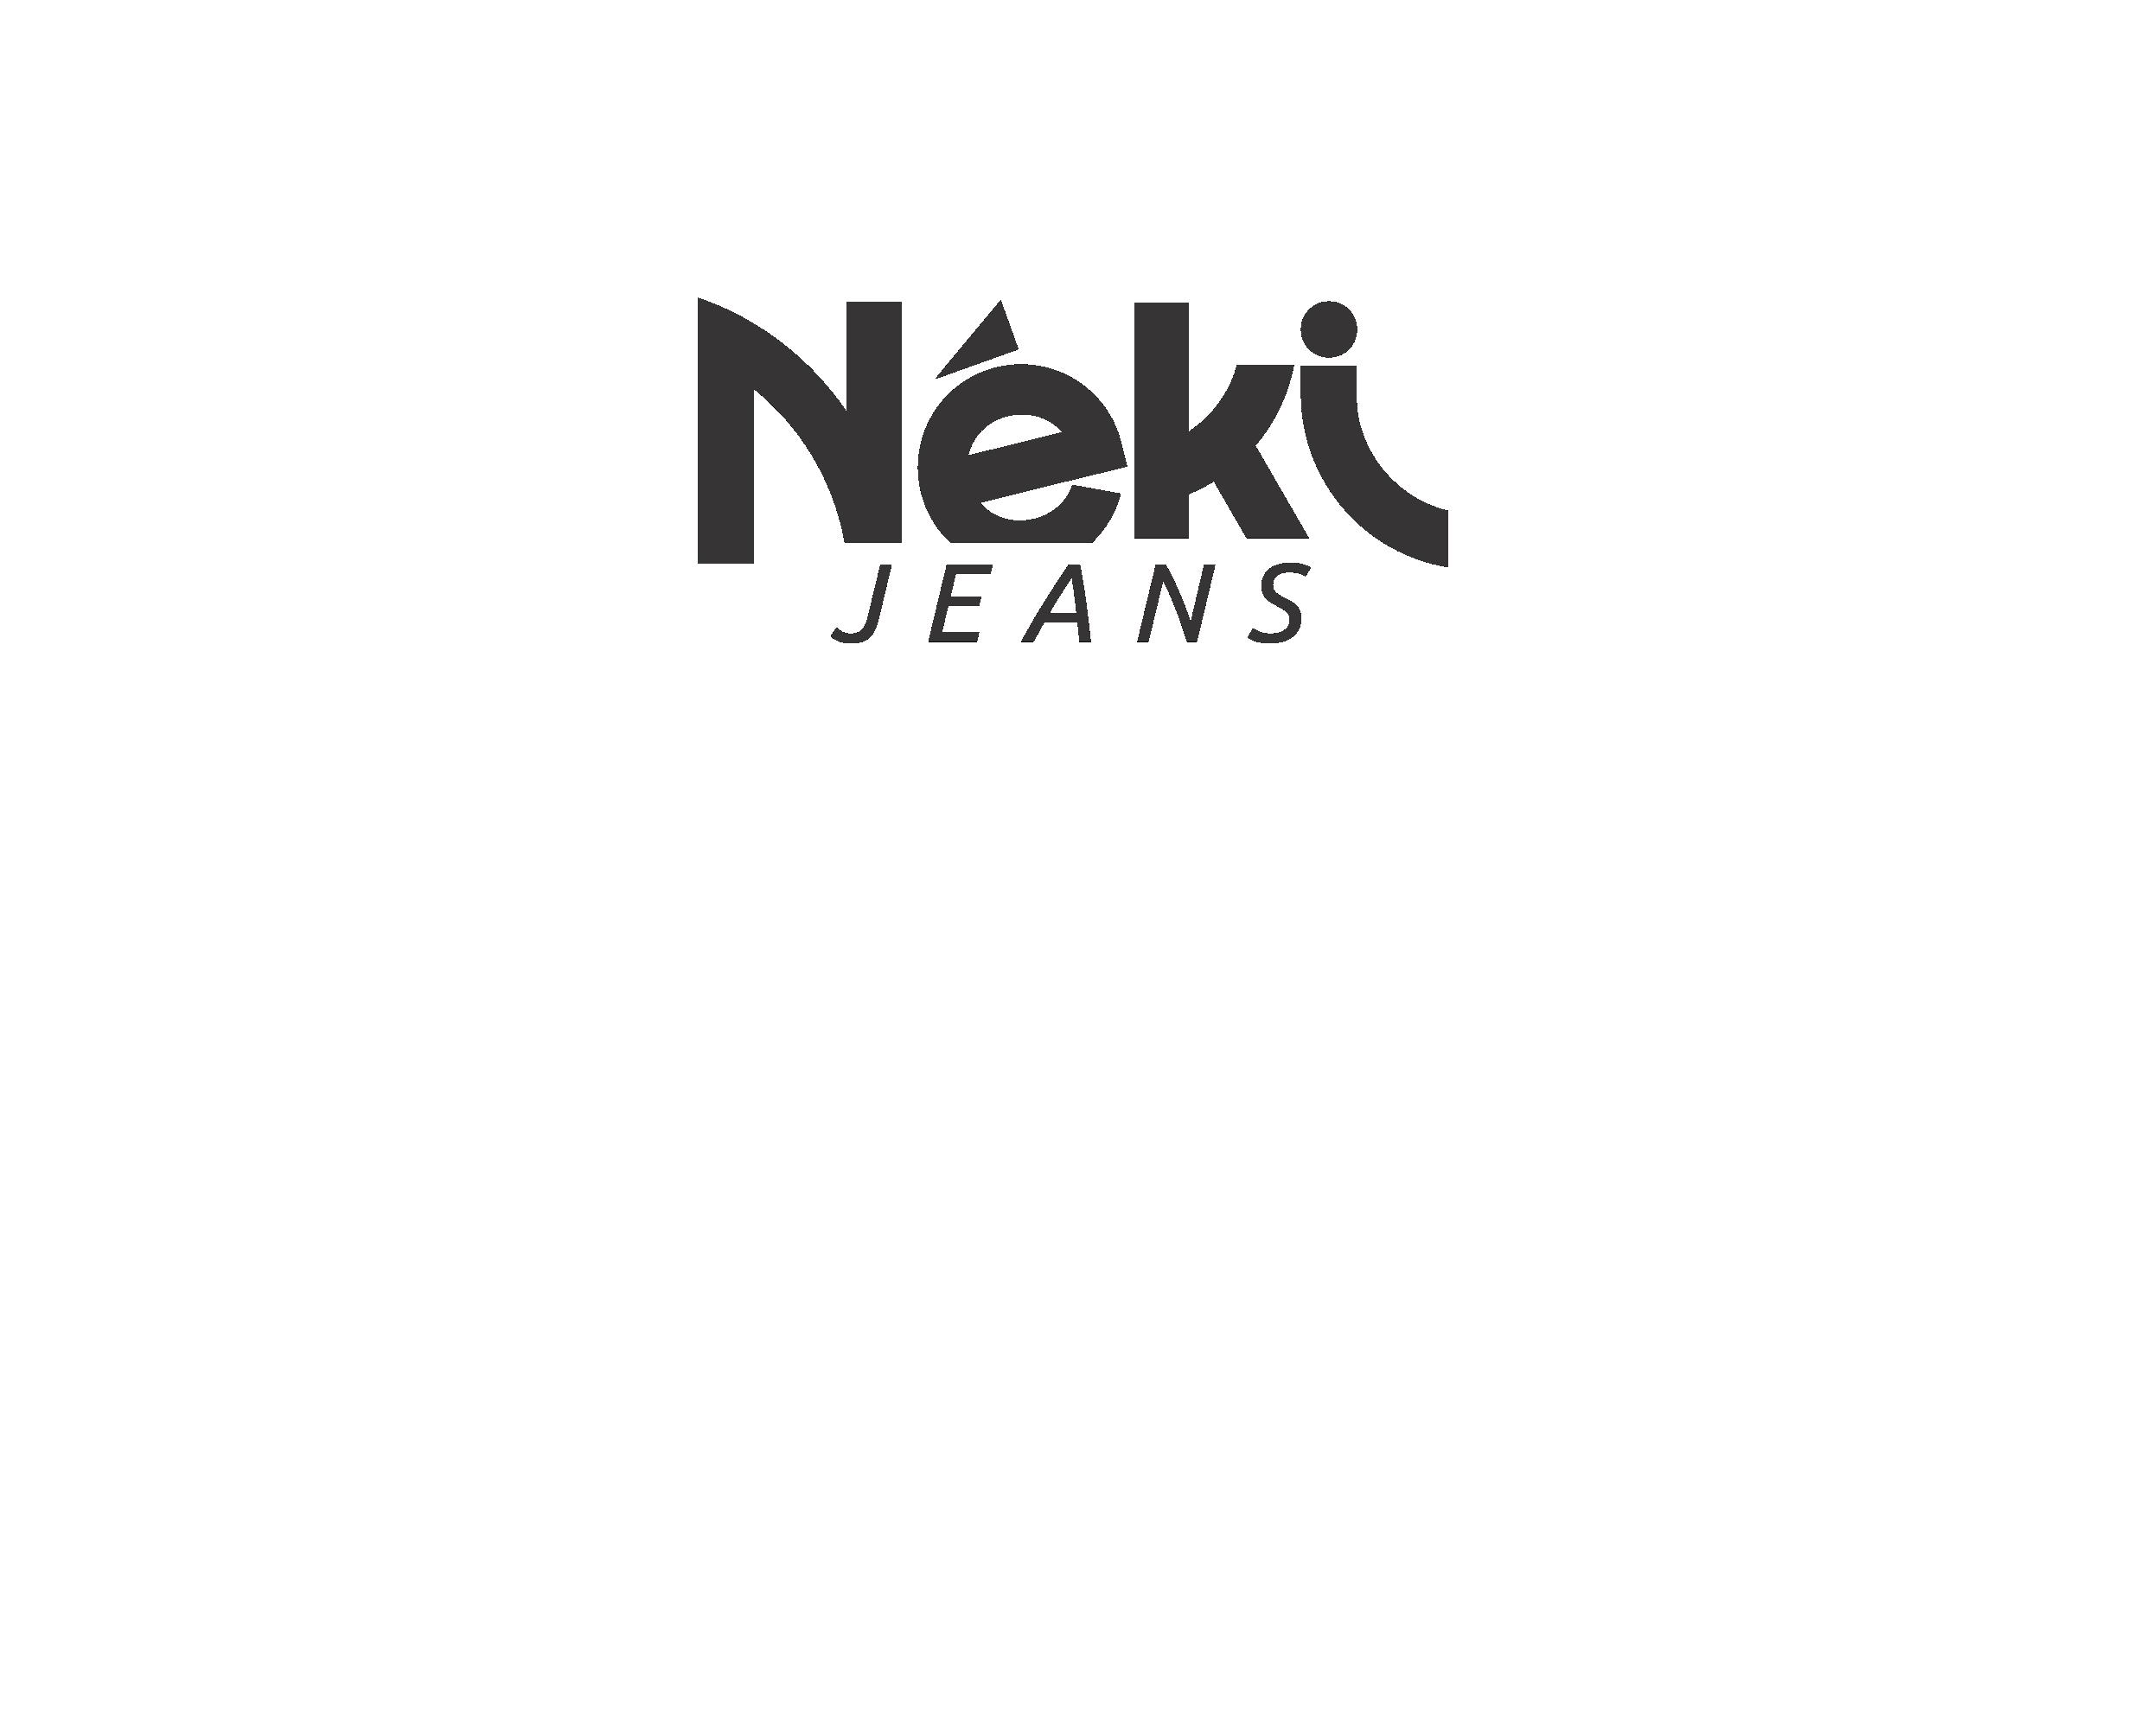 Néki Jeans